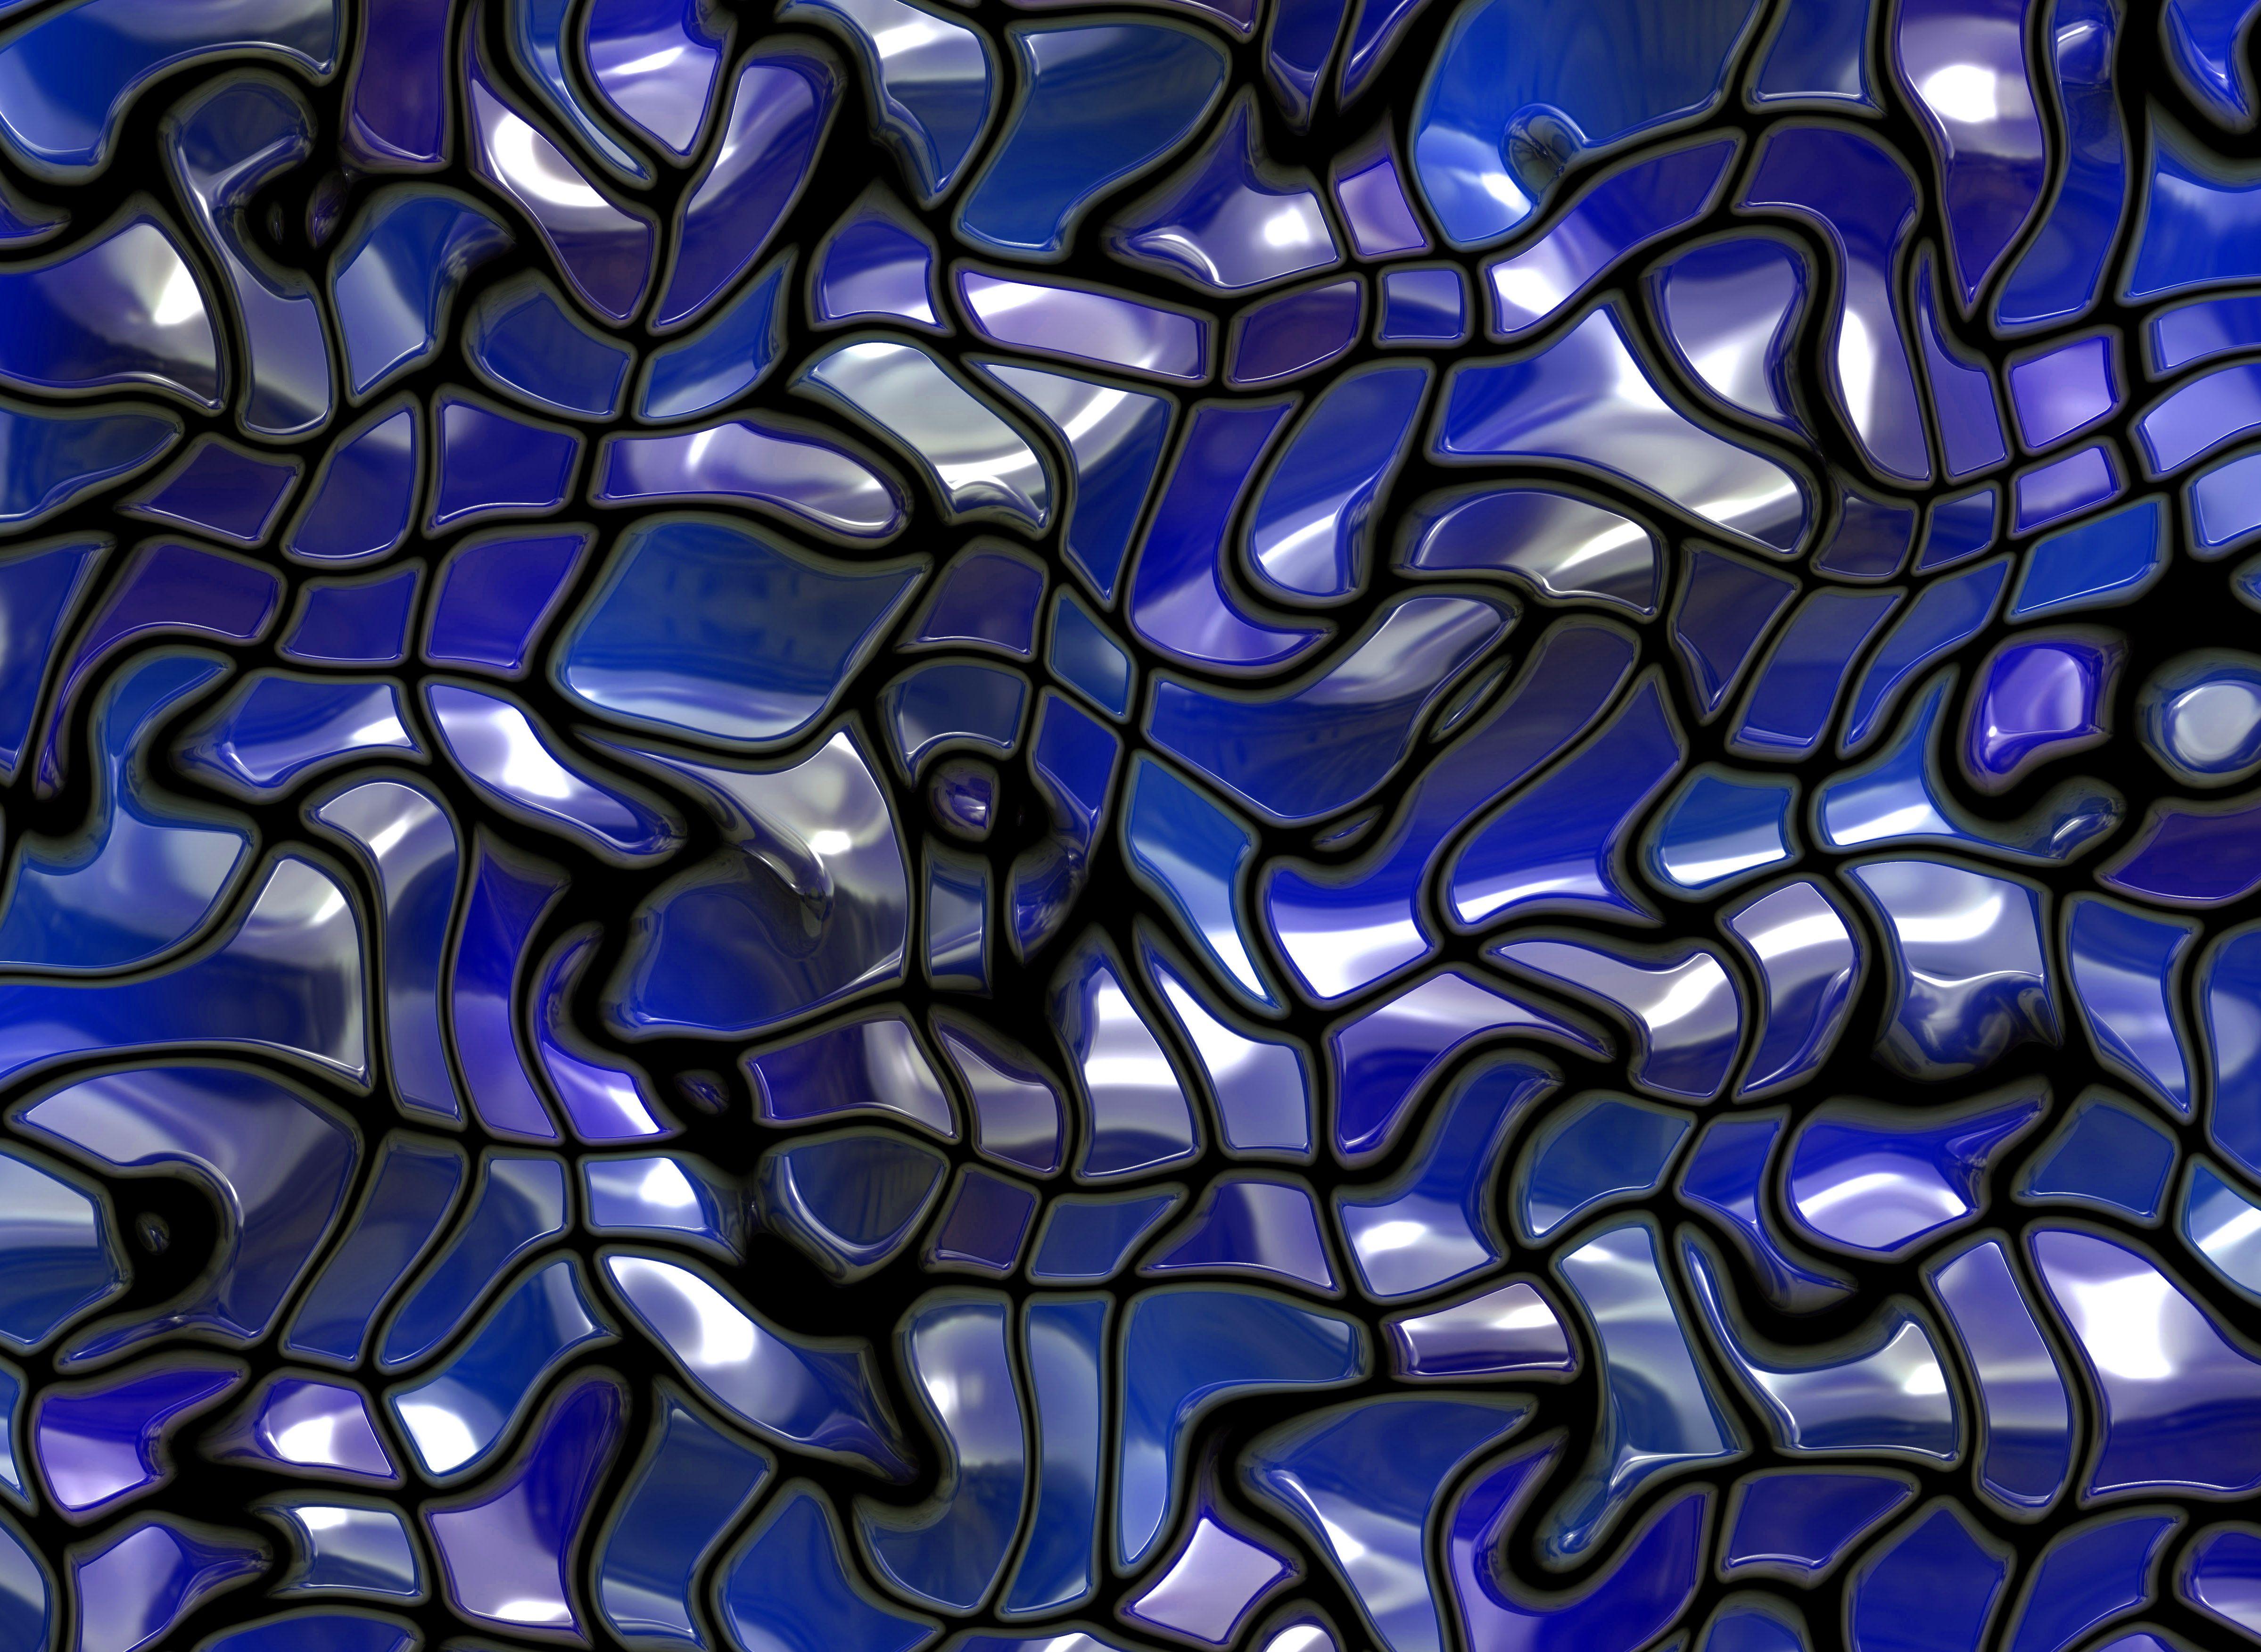 Abstract texture g  saltwater aquarium